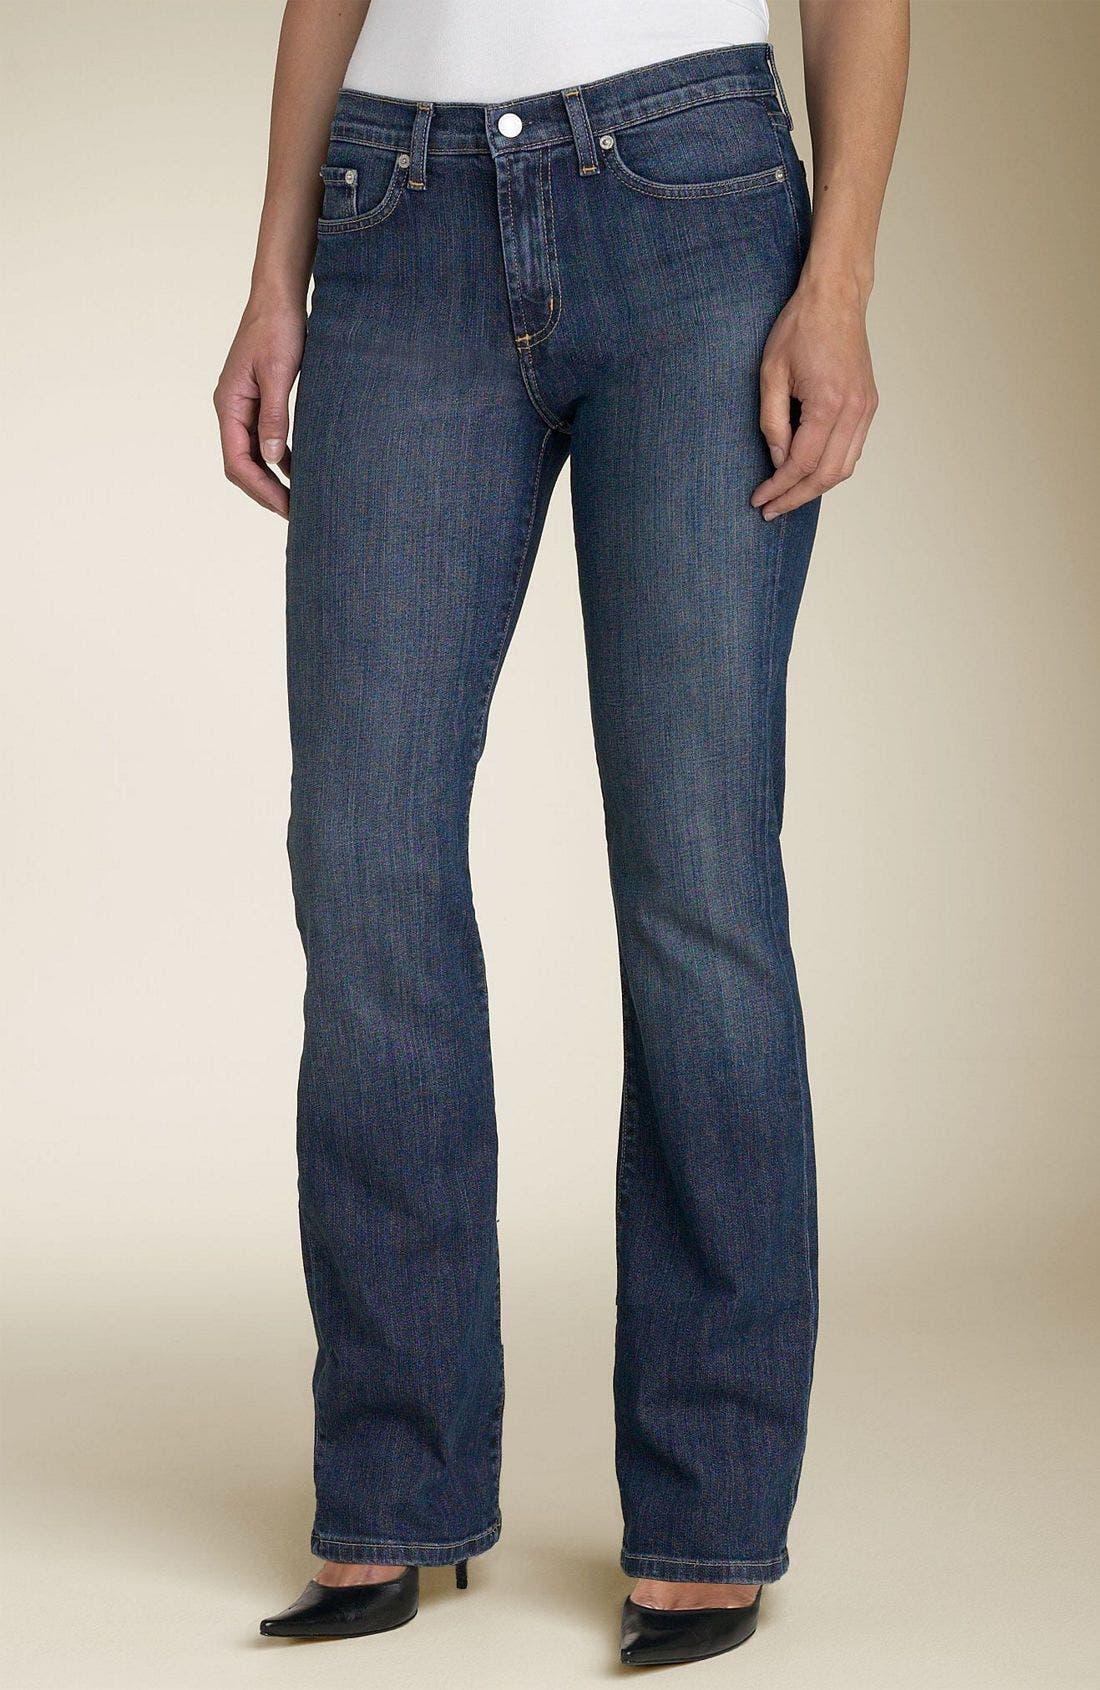 Five Pocket Stretch Jeans,                             Main thumbnail 1, color,                             DDN